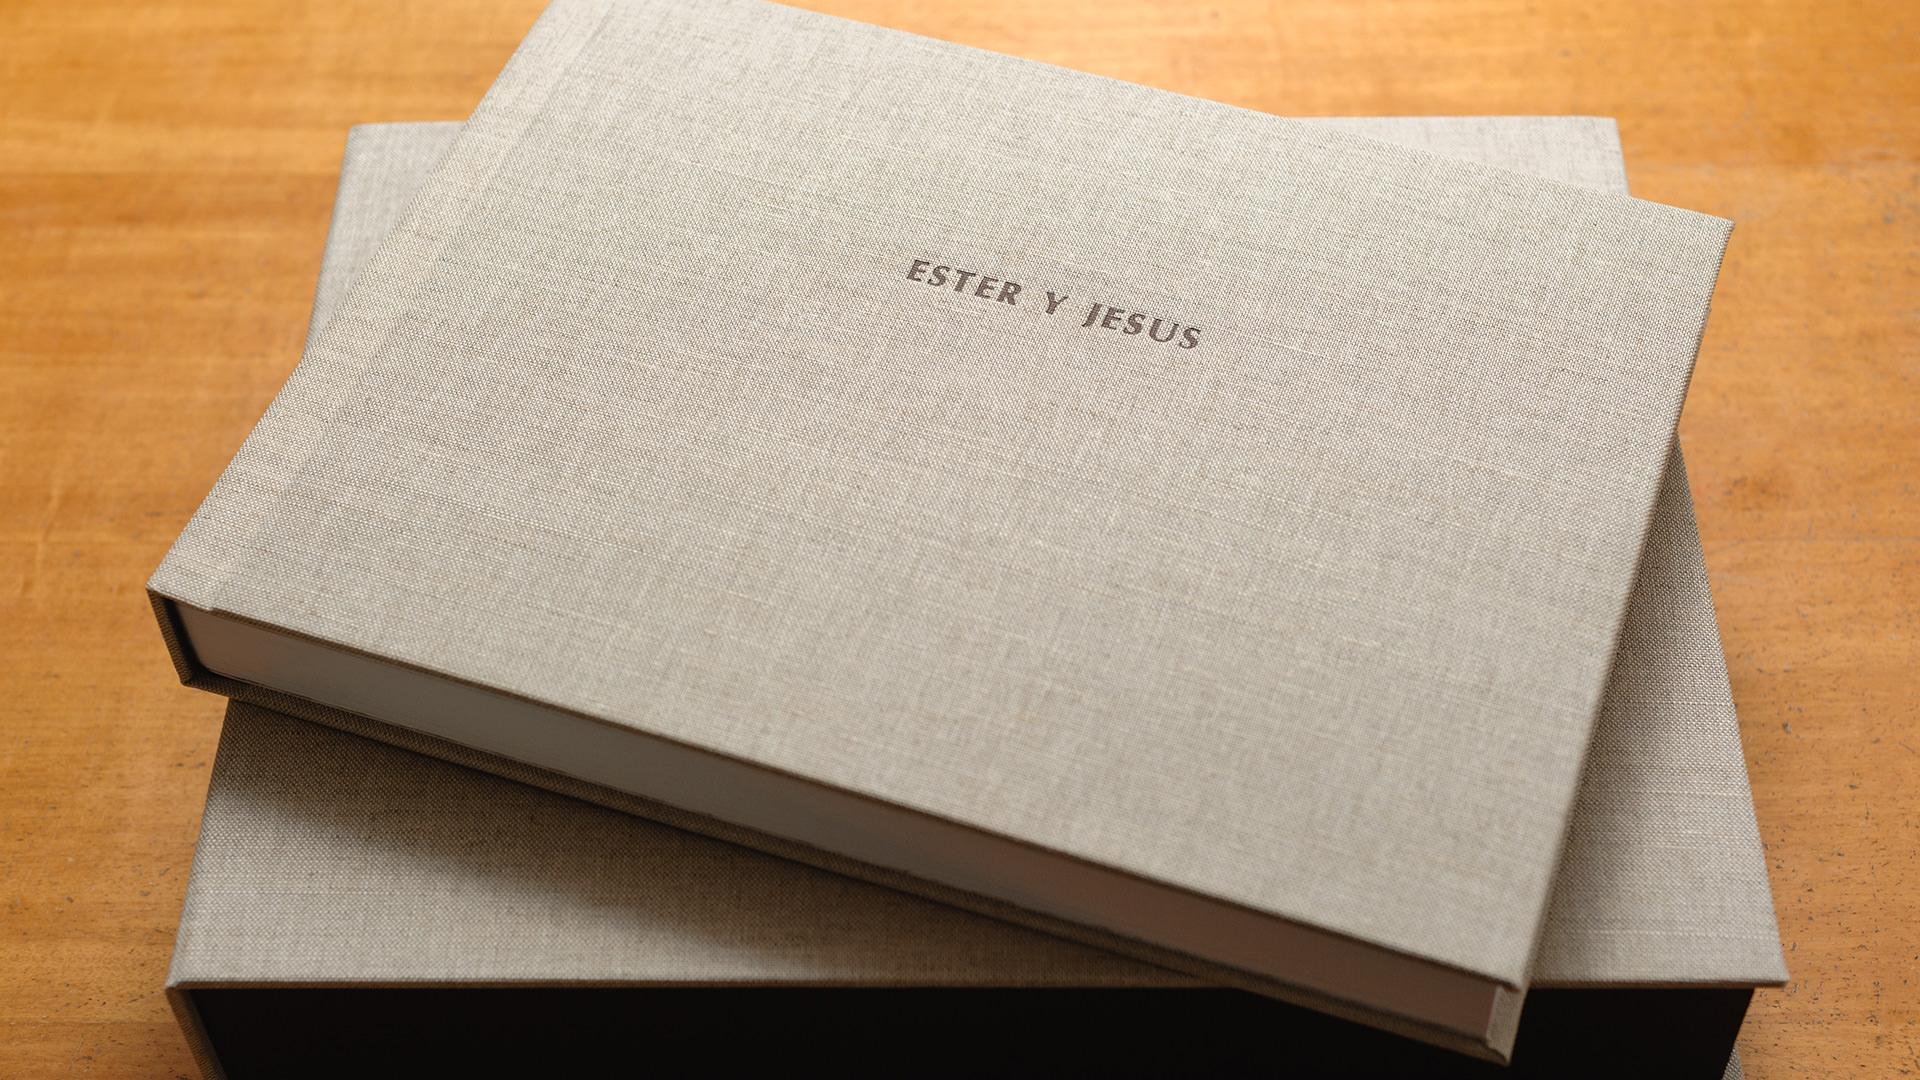 ester-jesus-album-boda-tapizado-vintage-collection-1920